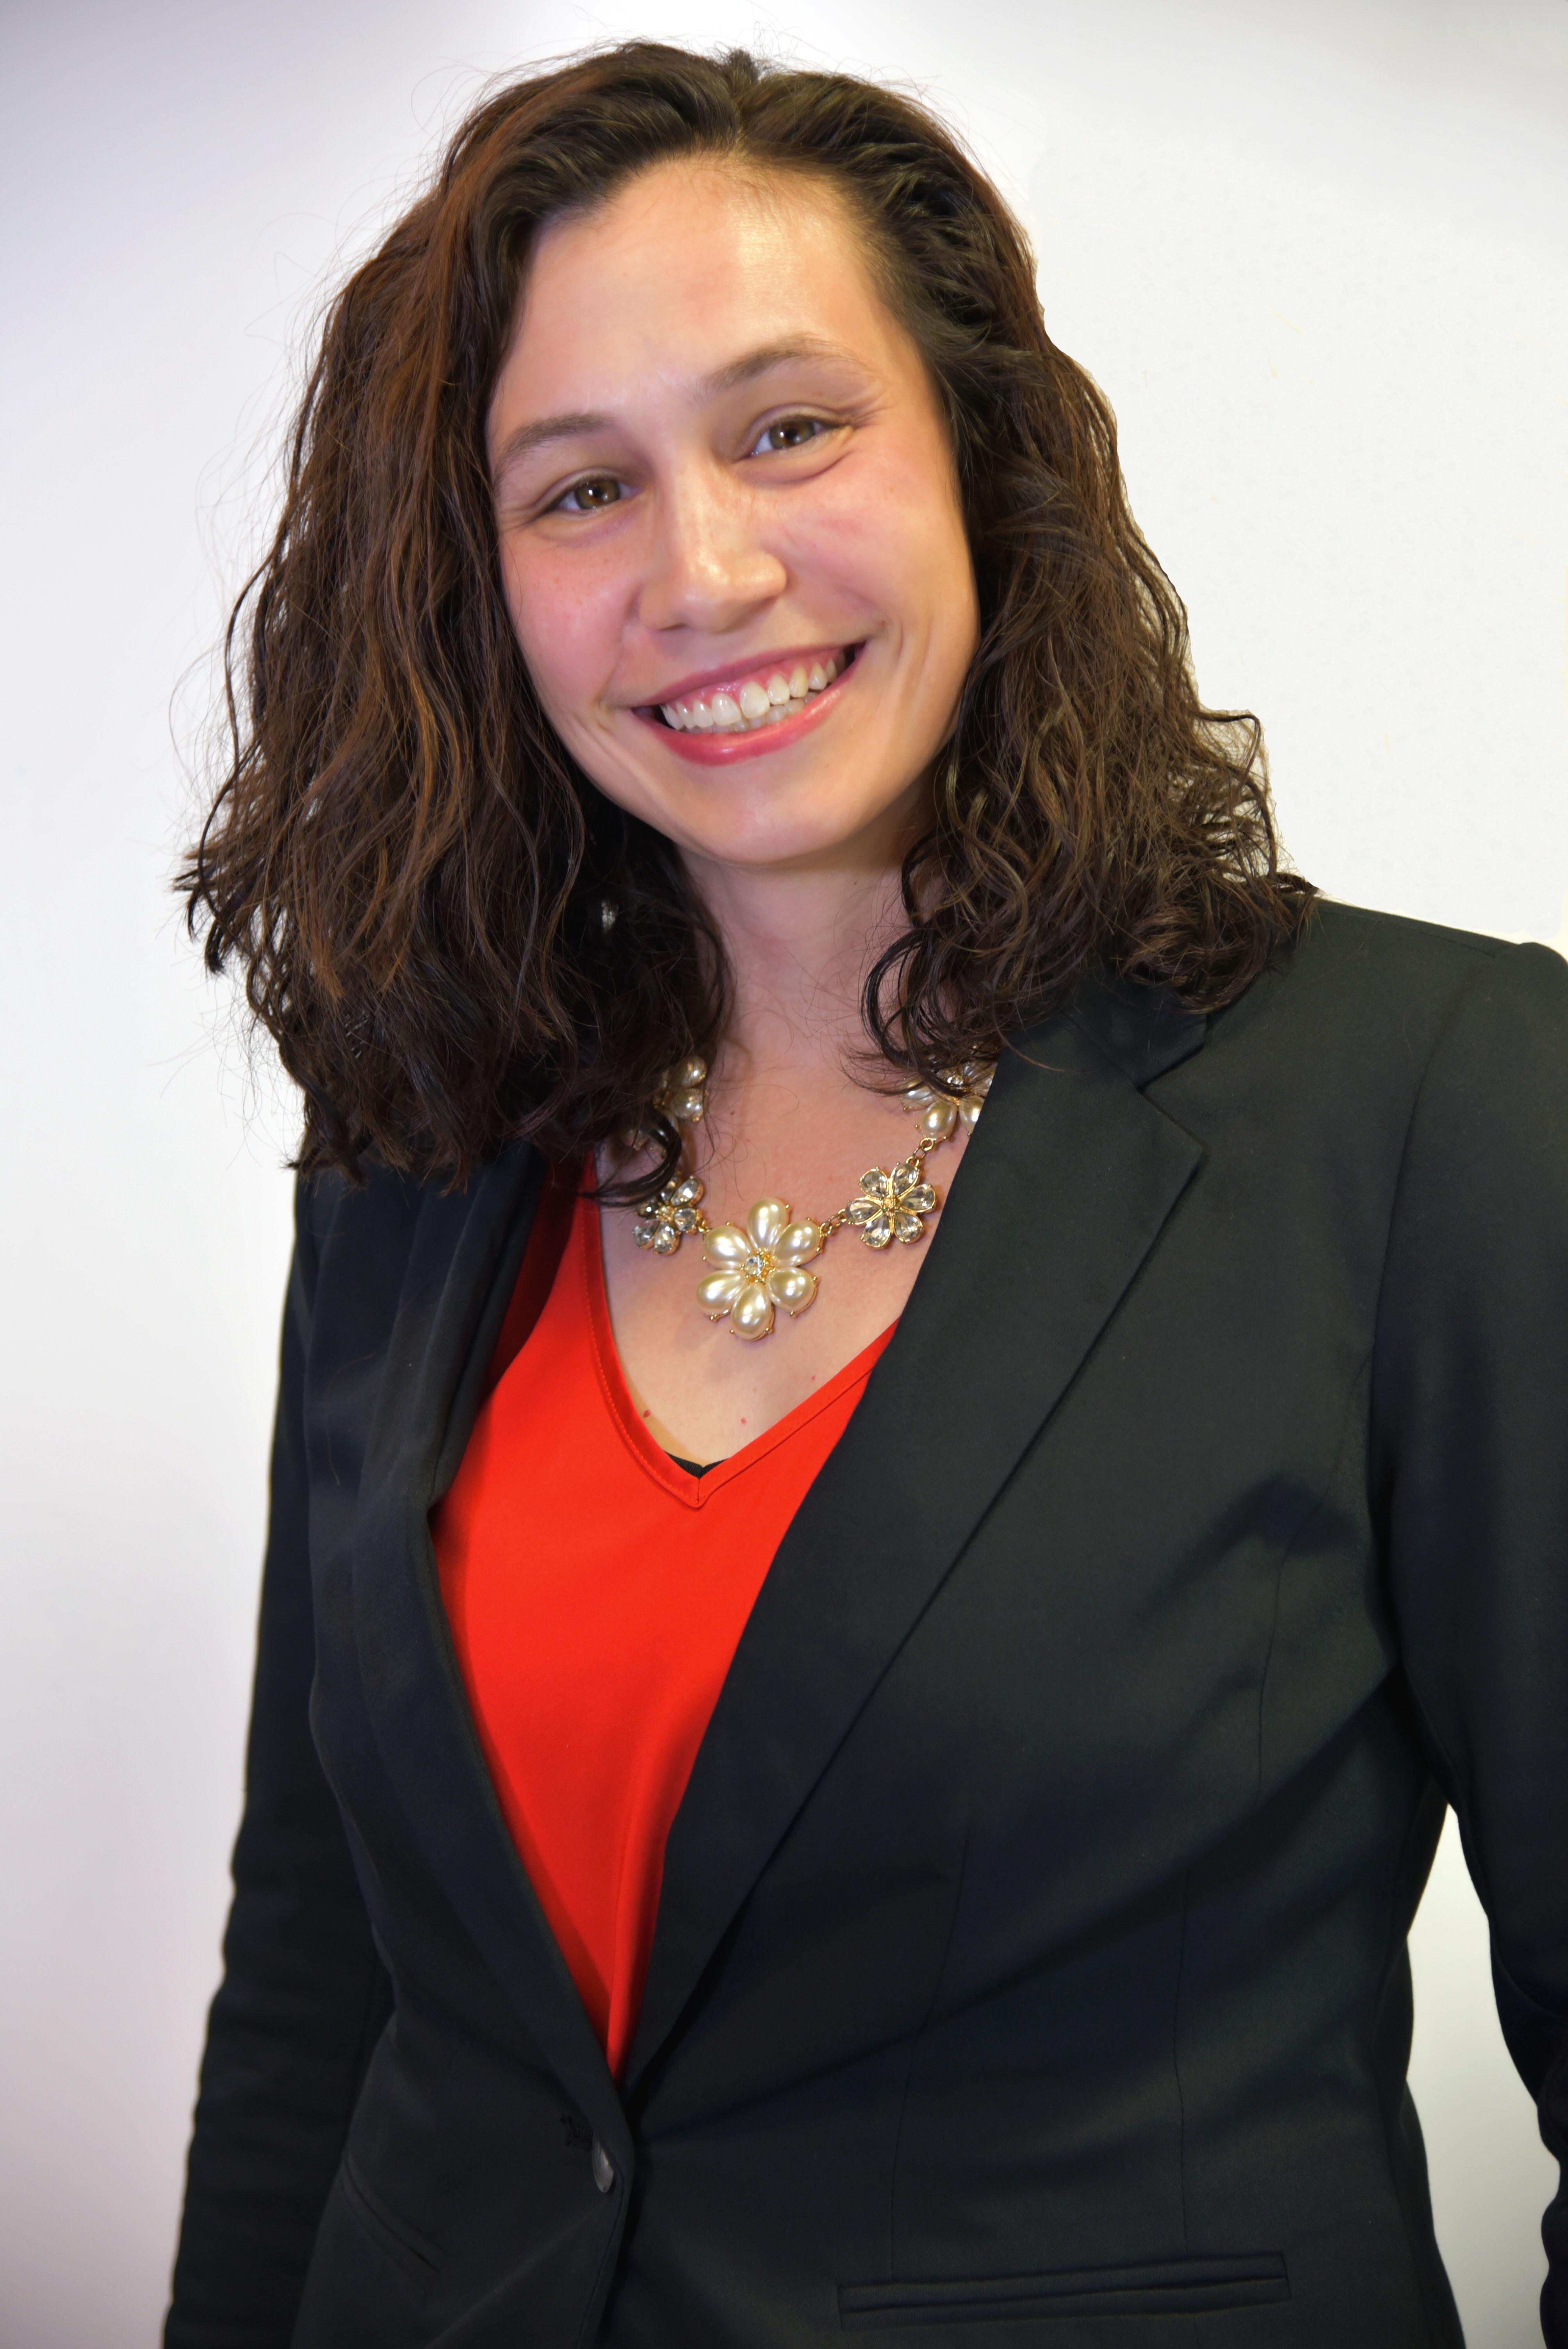 Kate Tortora